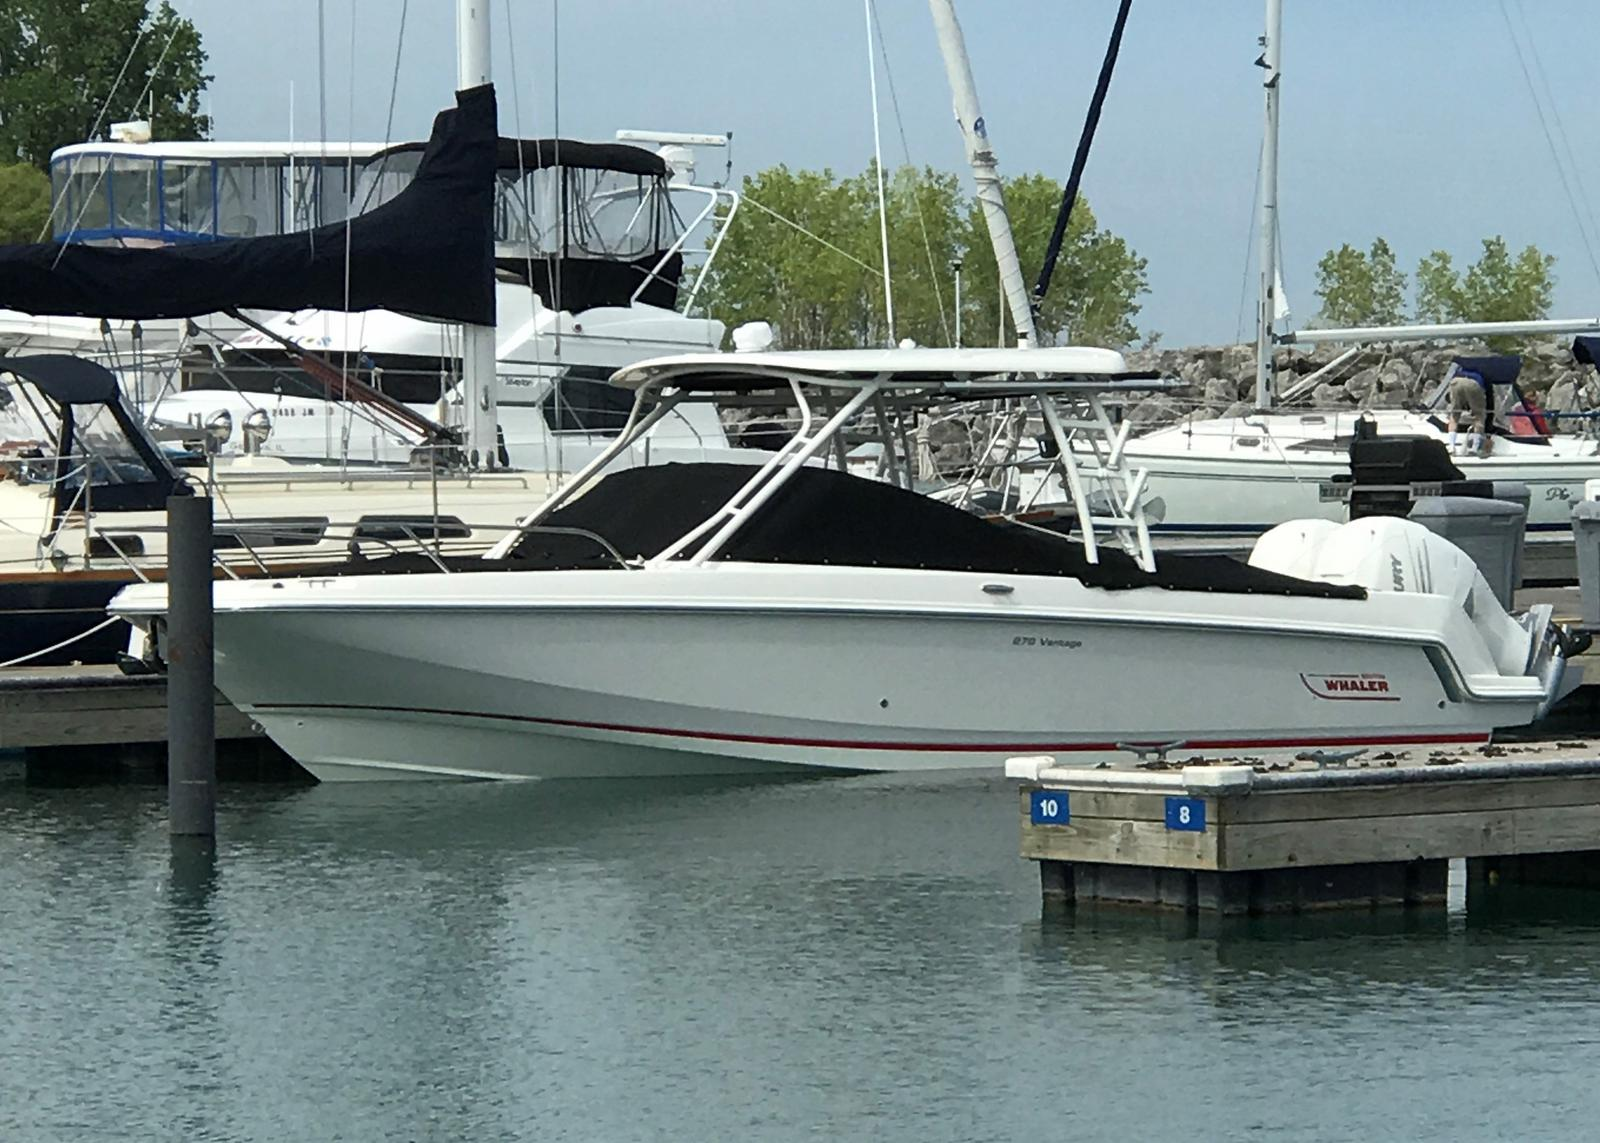 2017 Boston Whaler boat for sale, model of the boat is 270 Vantage Freshwater, Joystick, Loaded!!! & Image # 3 of 14